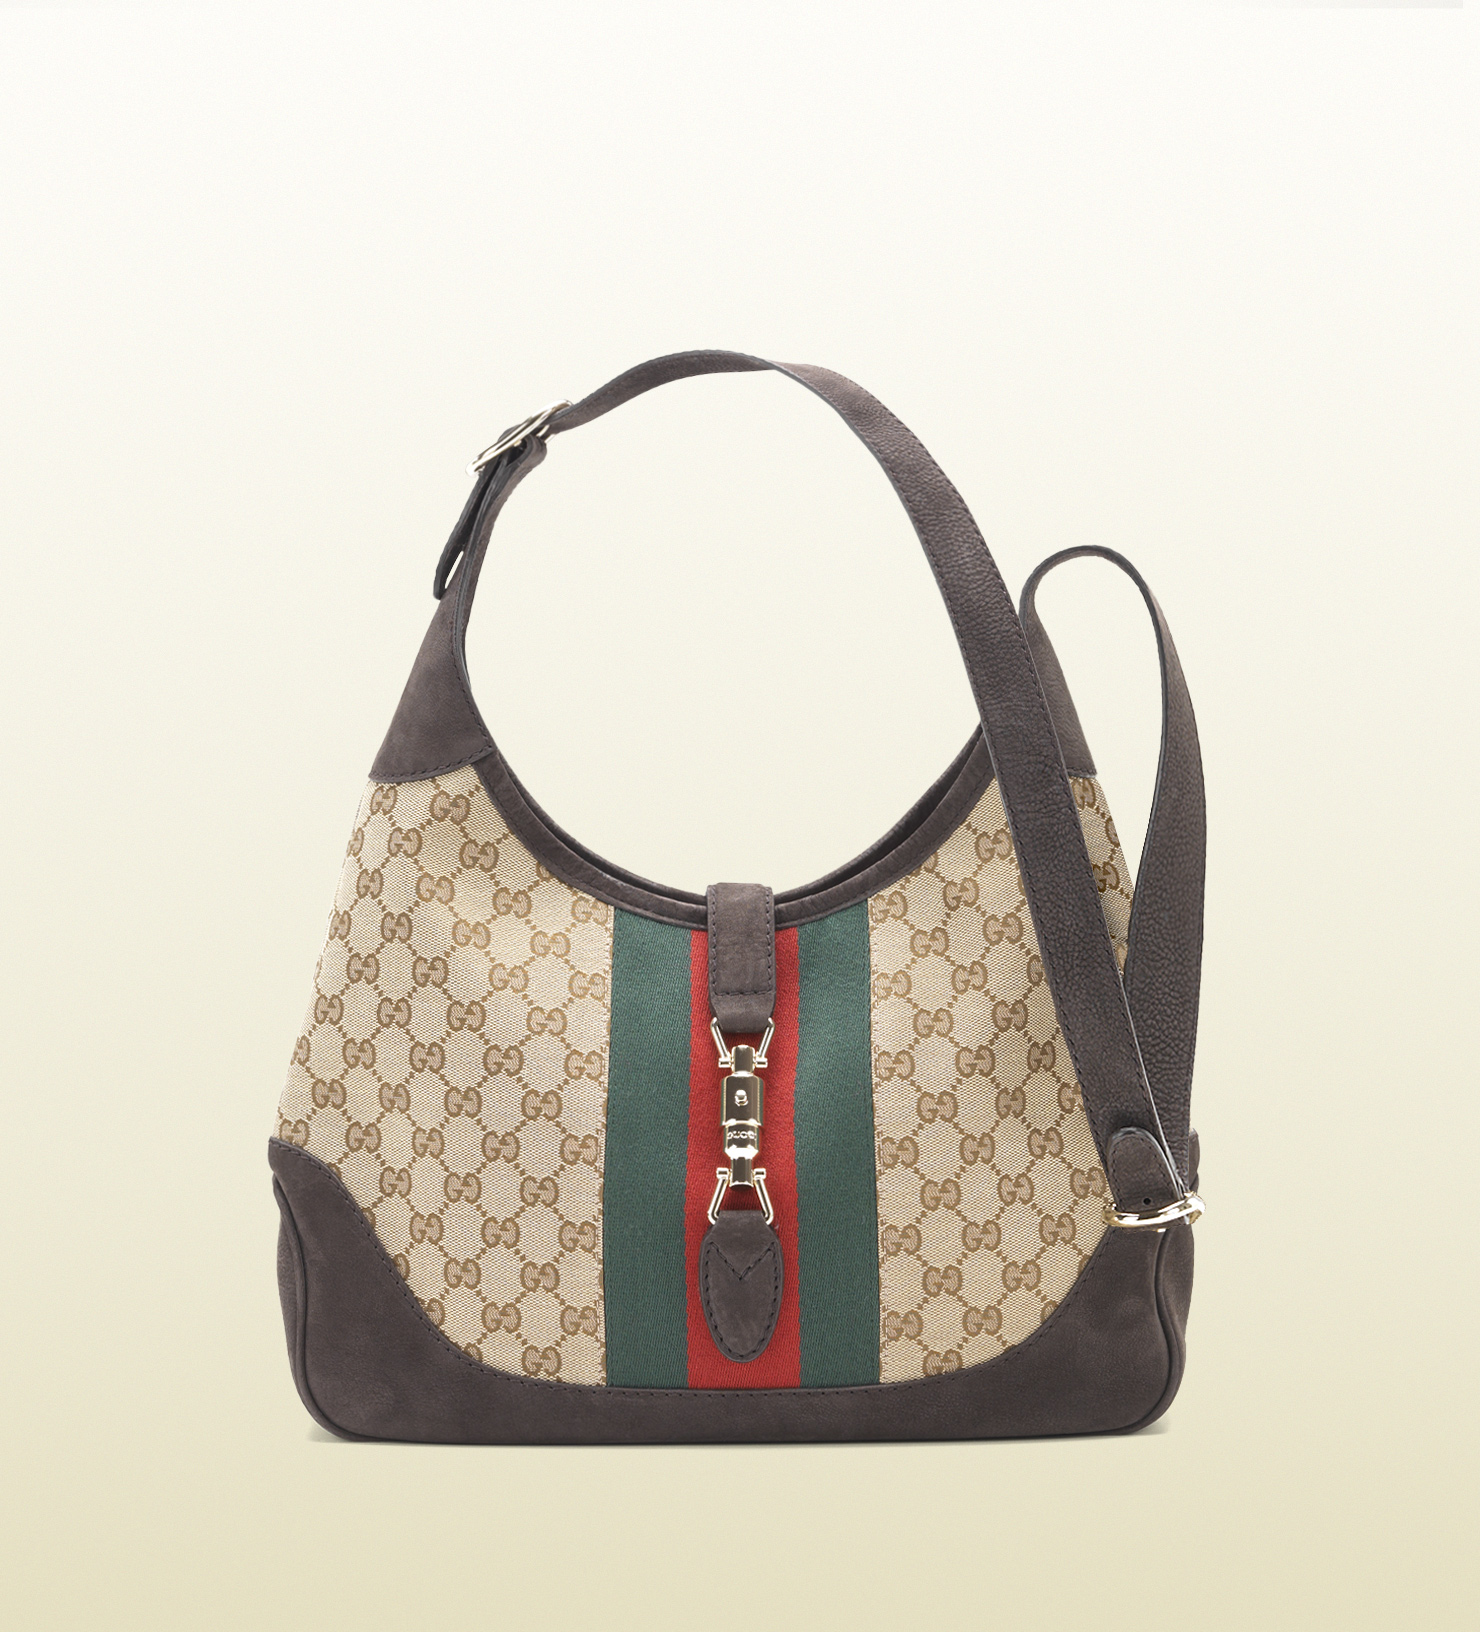 7babf24f8e8 Lyst - Gucci Jackie Shoulder Bag in Natural